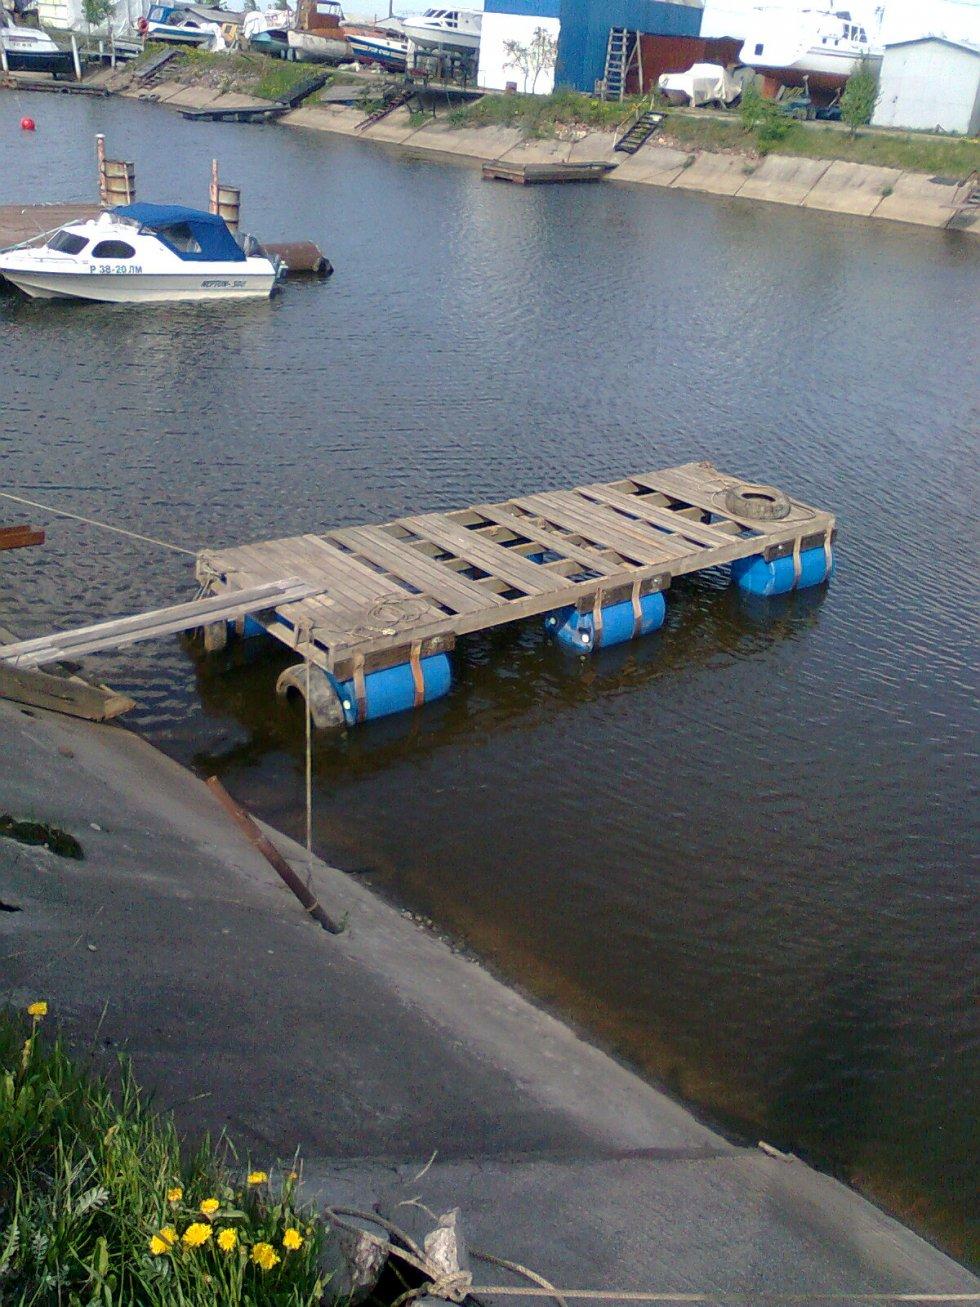 плавающий причал для лодок